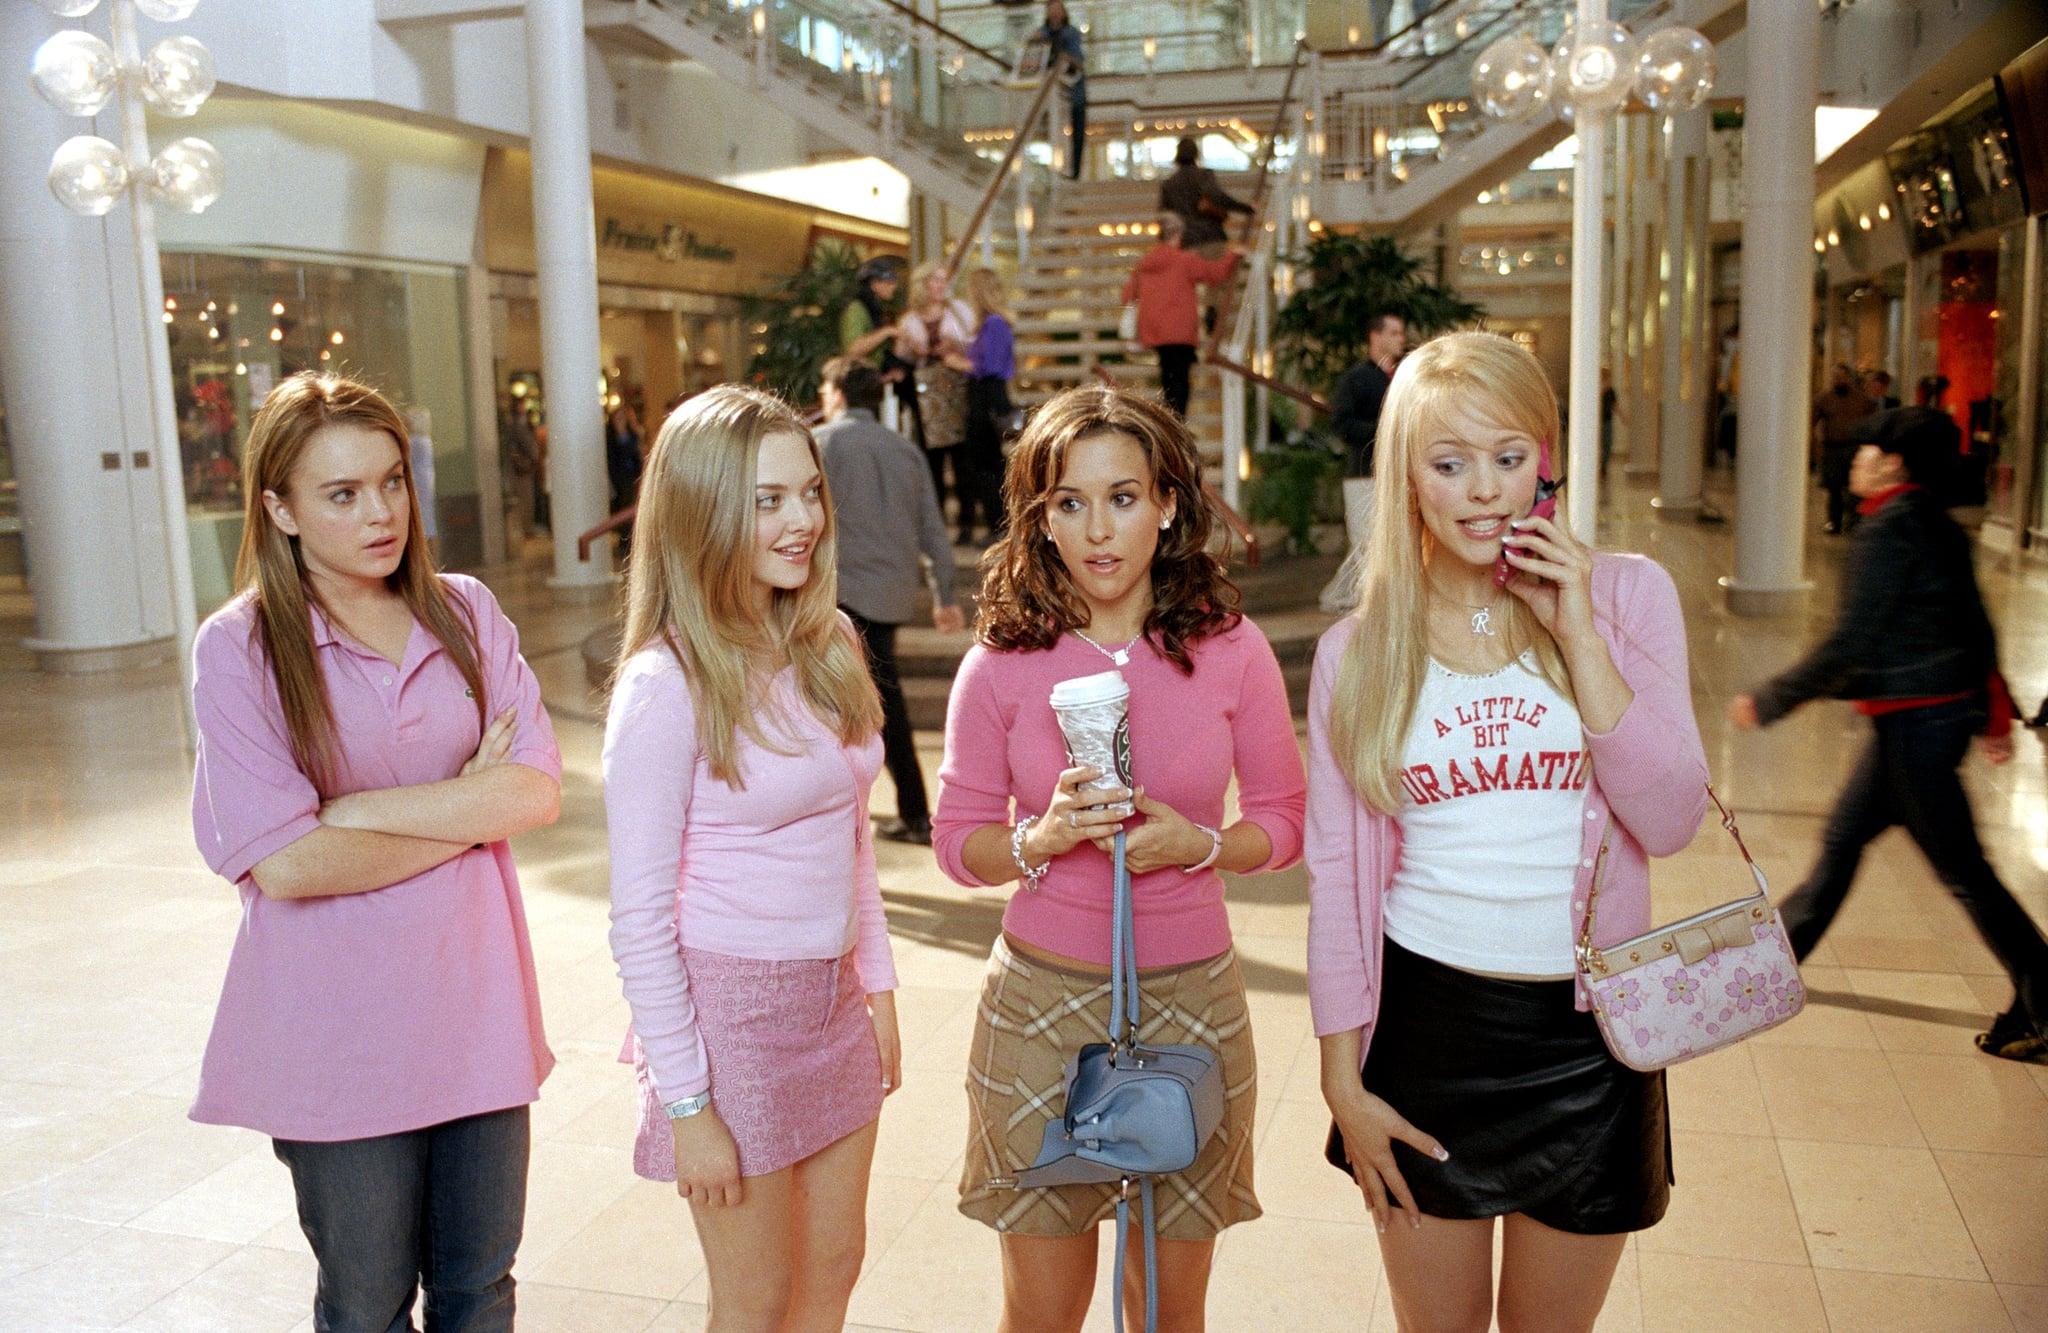 MEAN GIRLS, Lindsay Lohan, Amanda Seyfried, Lacey Chabert, Rachel McAdams, 2004, (c) Paramount/courtesy Everett Collection